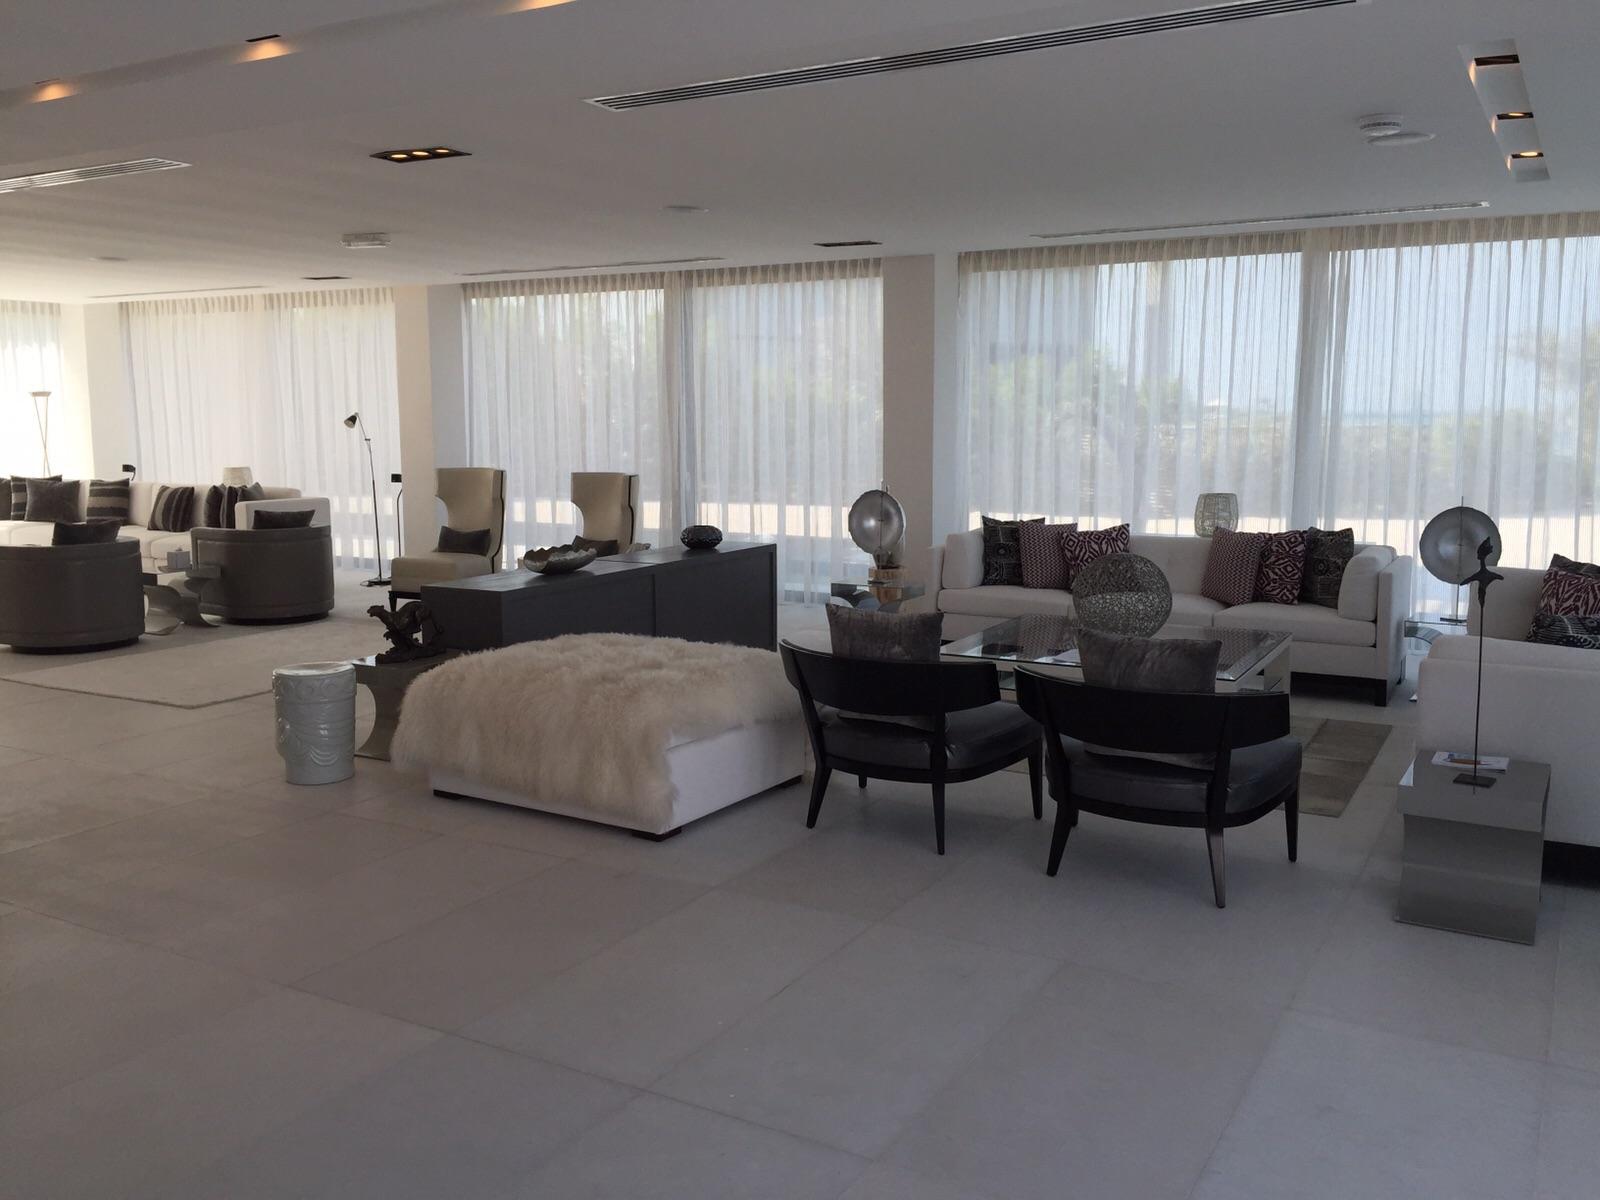 zaya nurai interior, Dubai, Middle East, Pierchic, zaya nurai, zaya nurai resort